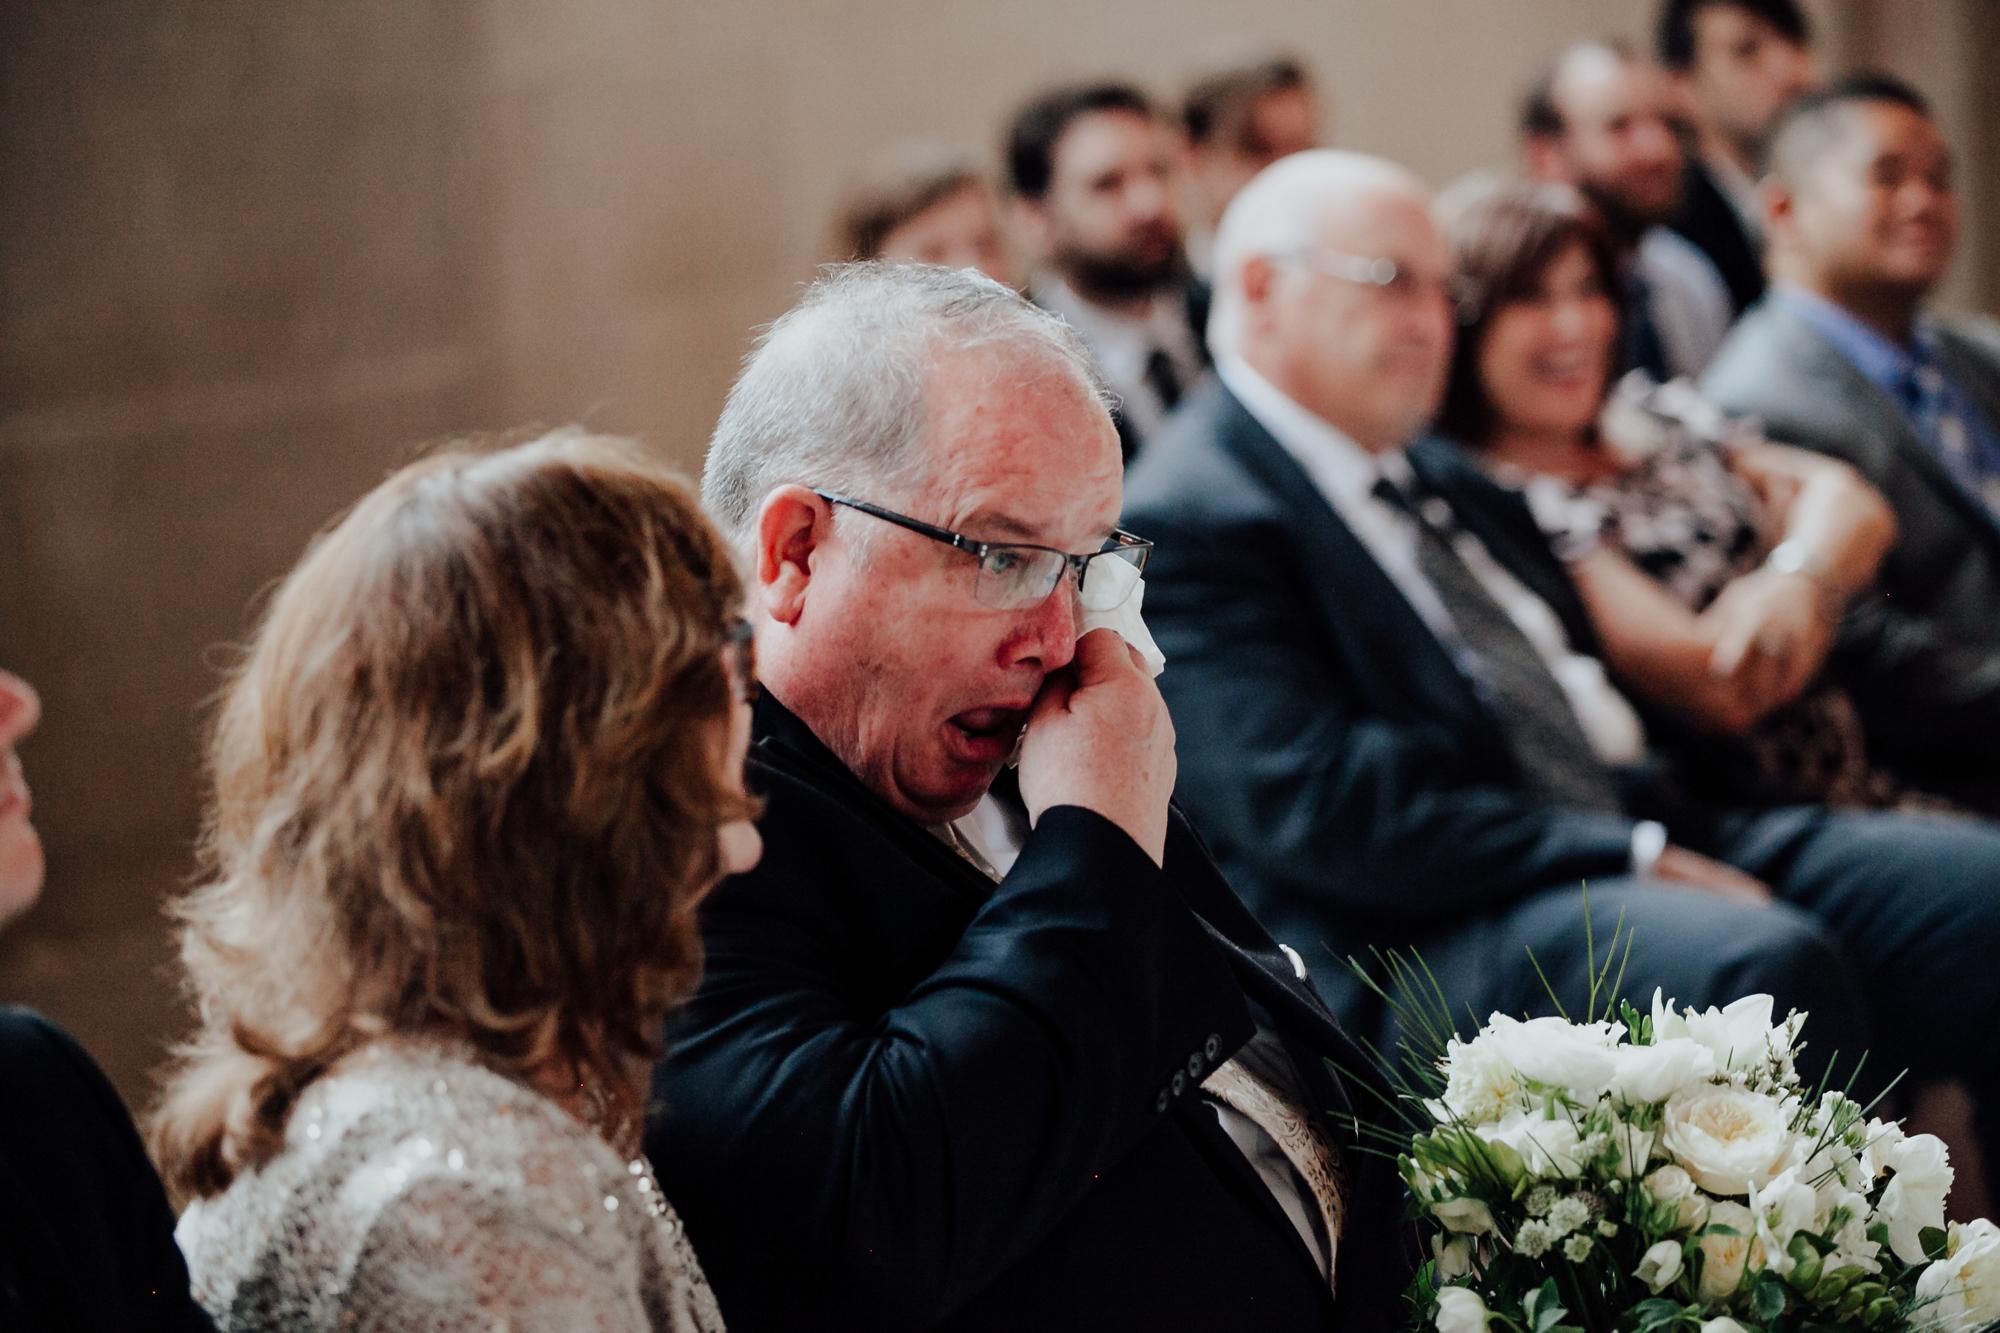 san-francisco-city-hall-wedding-marble-rye-photography-011718.JPG